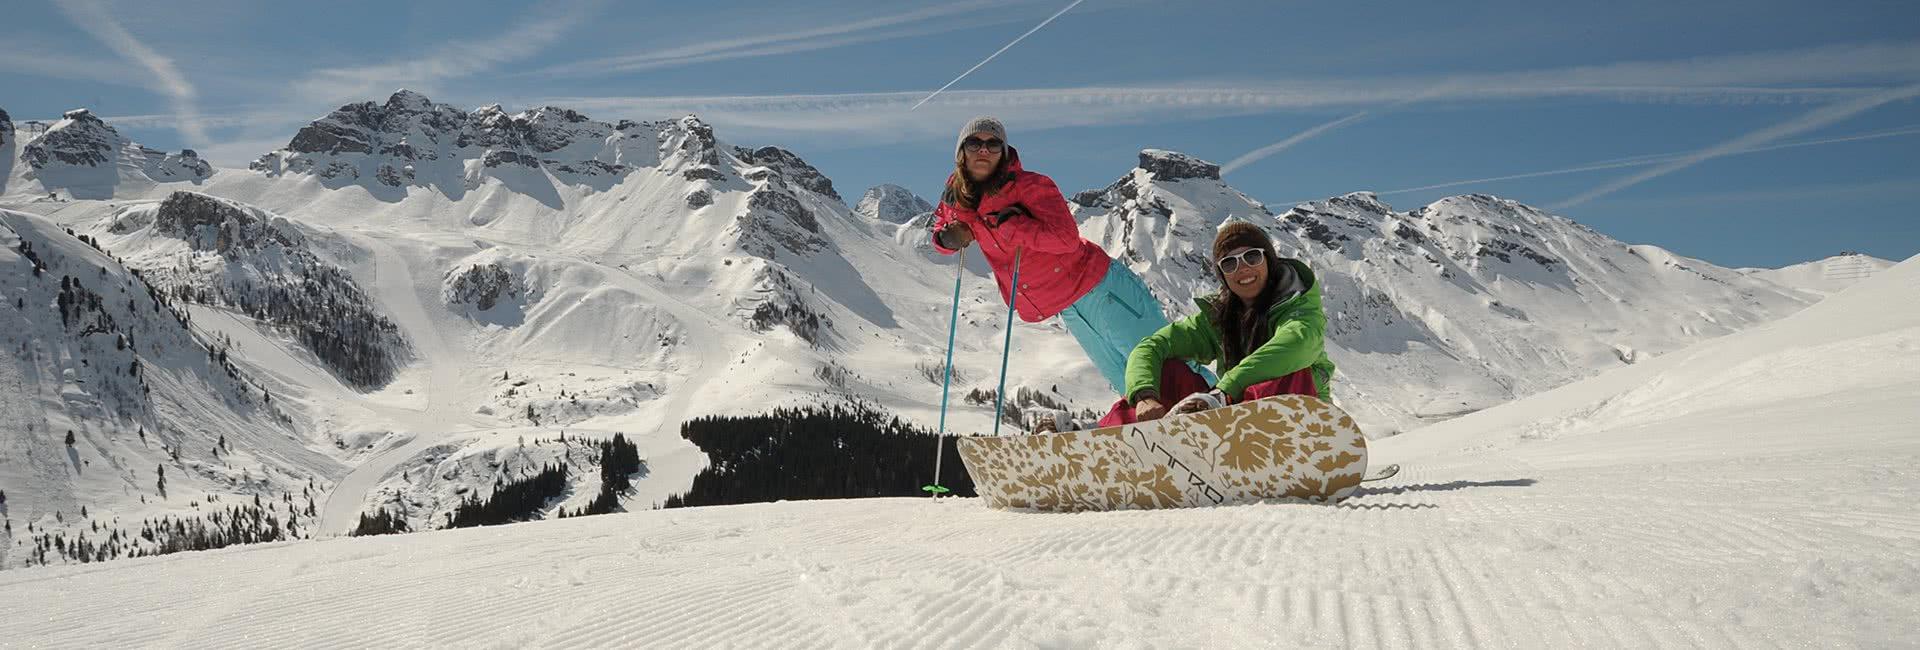 italy u0027s best snowboarding resorts in 2017 u0026 2018 sno